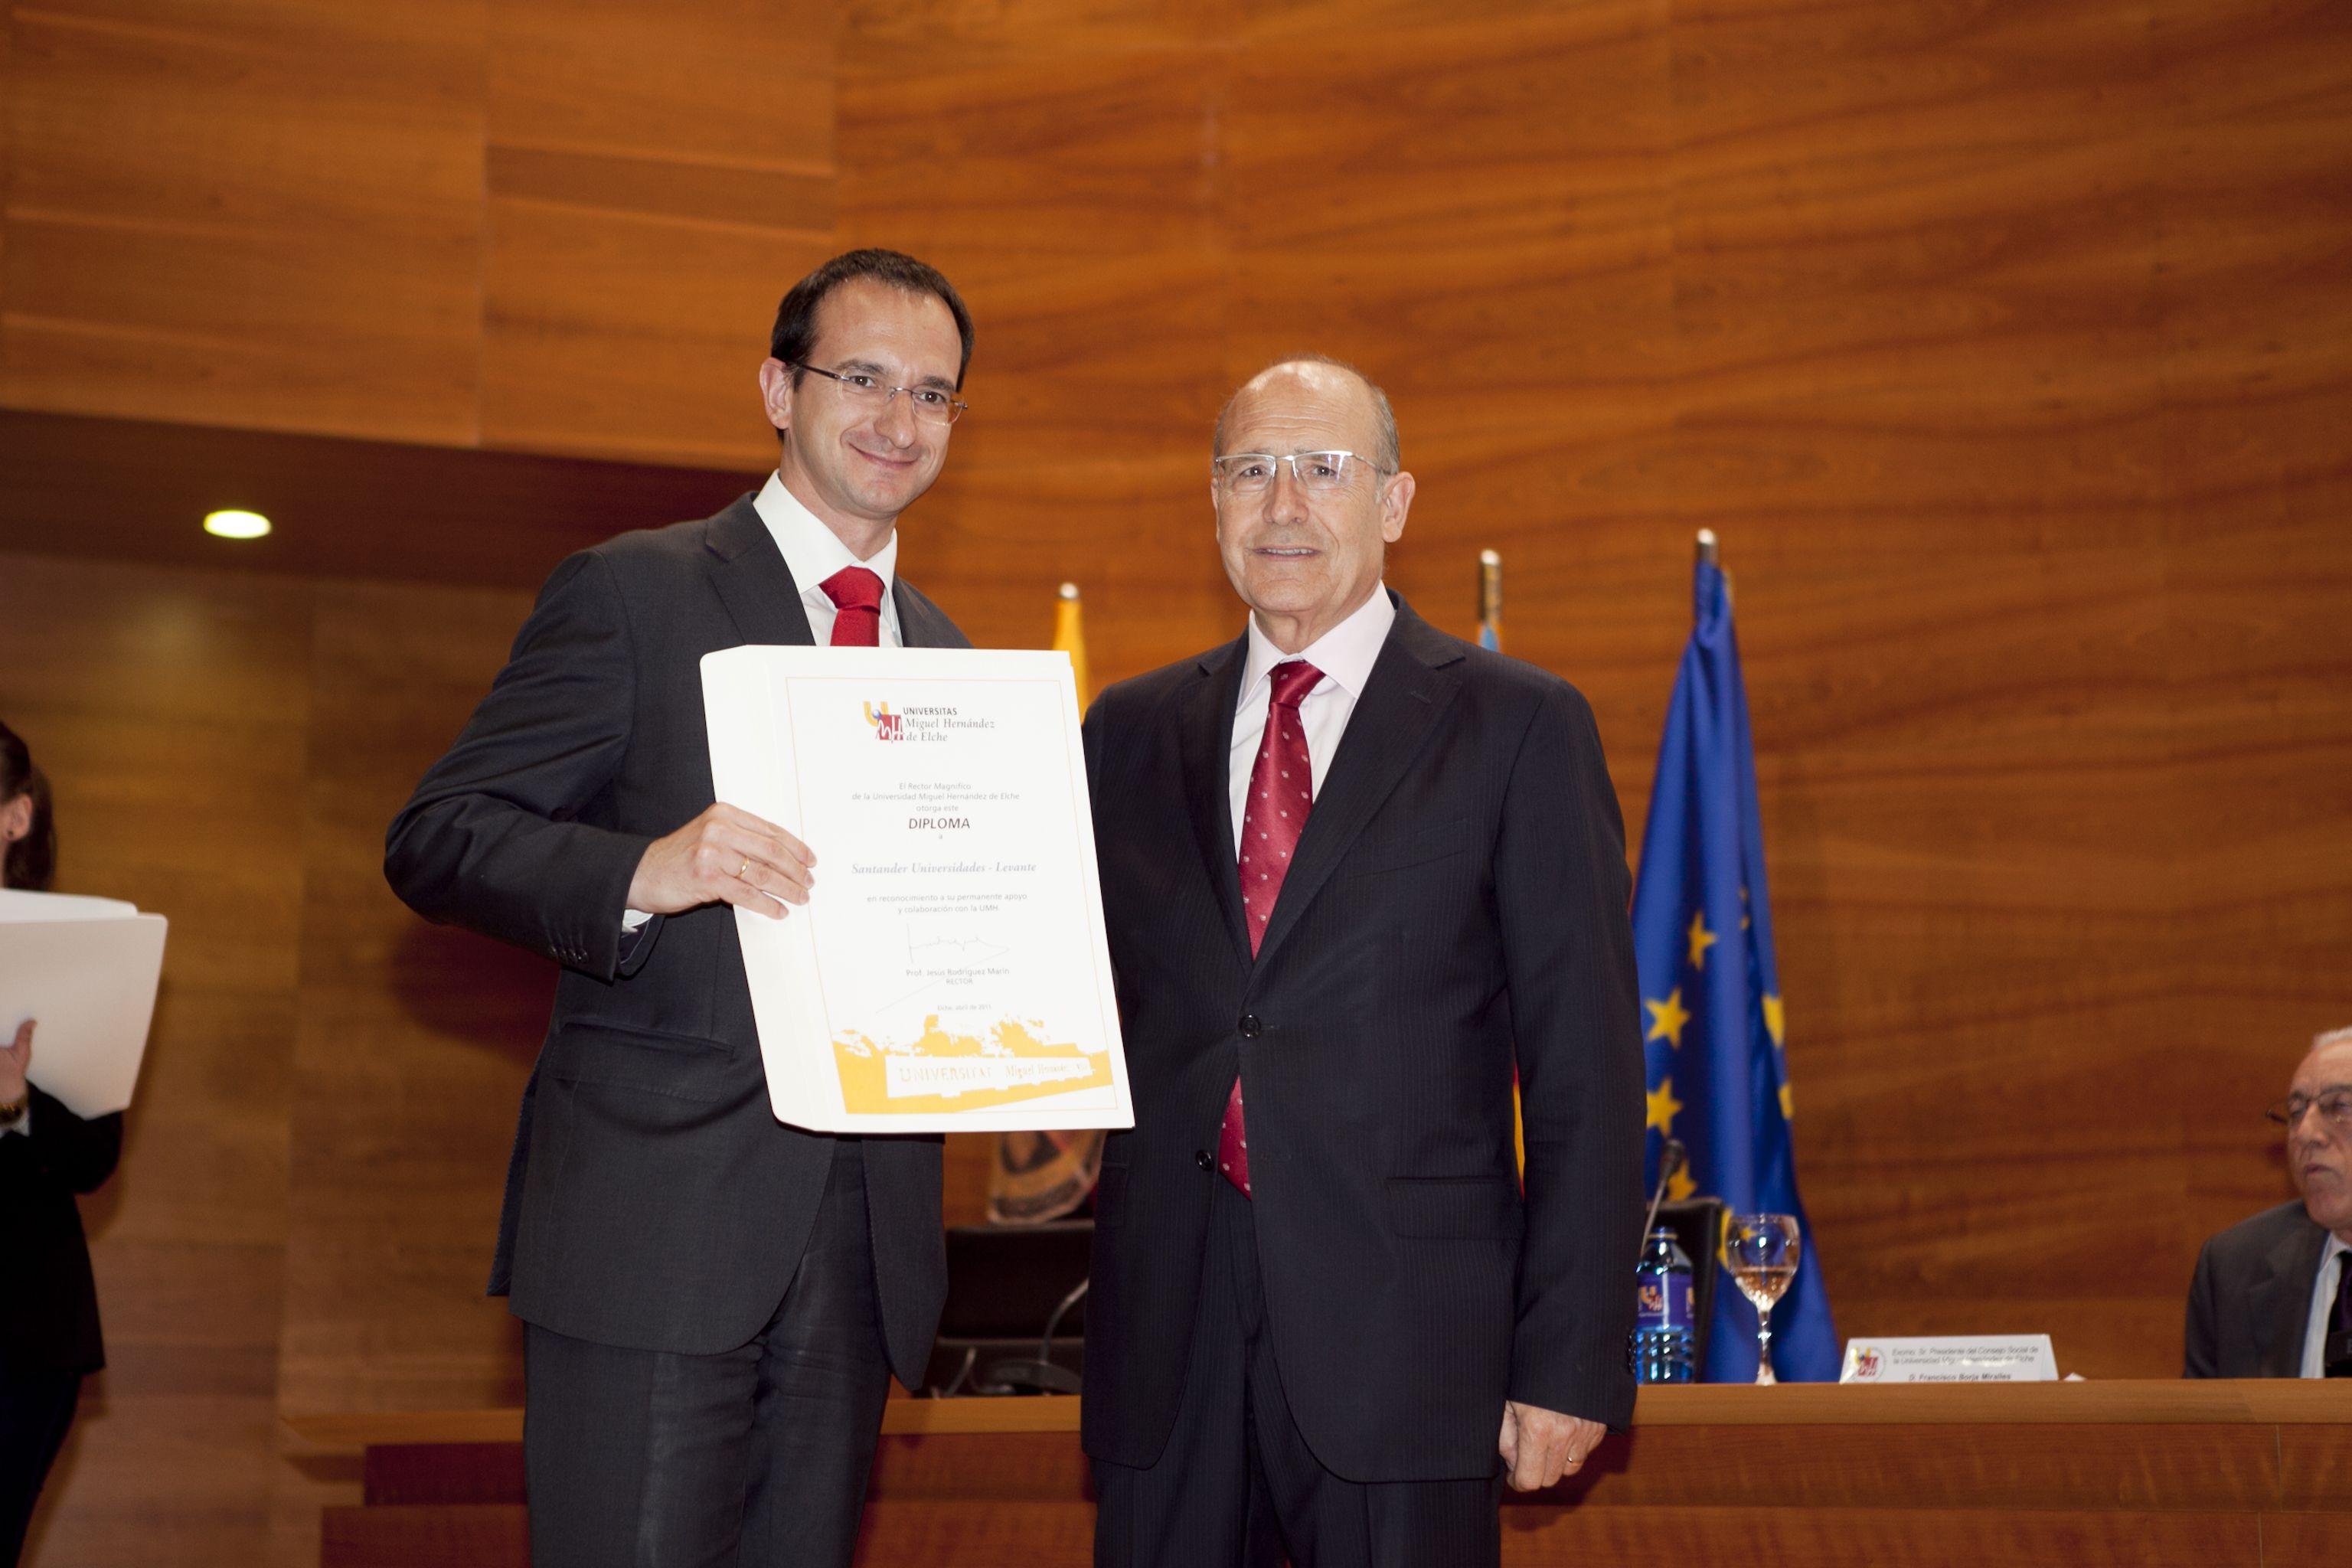 umh-diplomas-rector_mg_6963.jpg